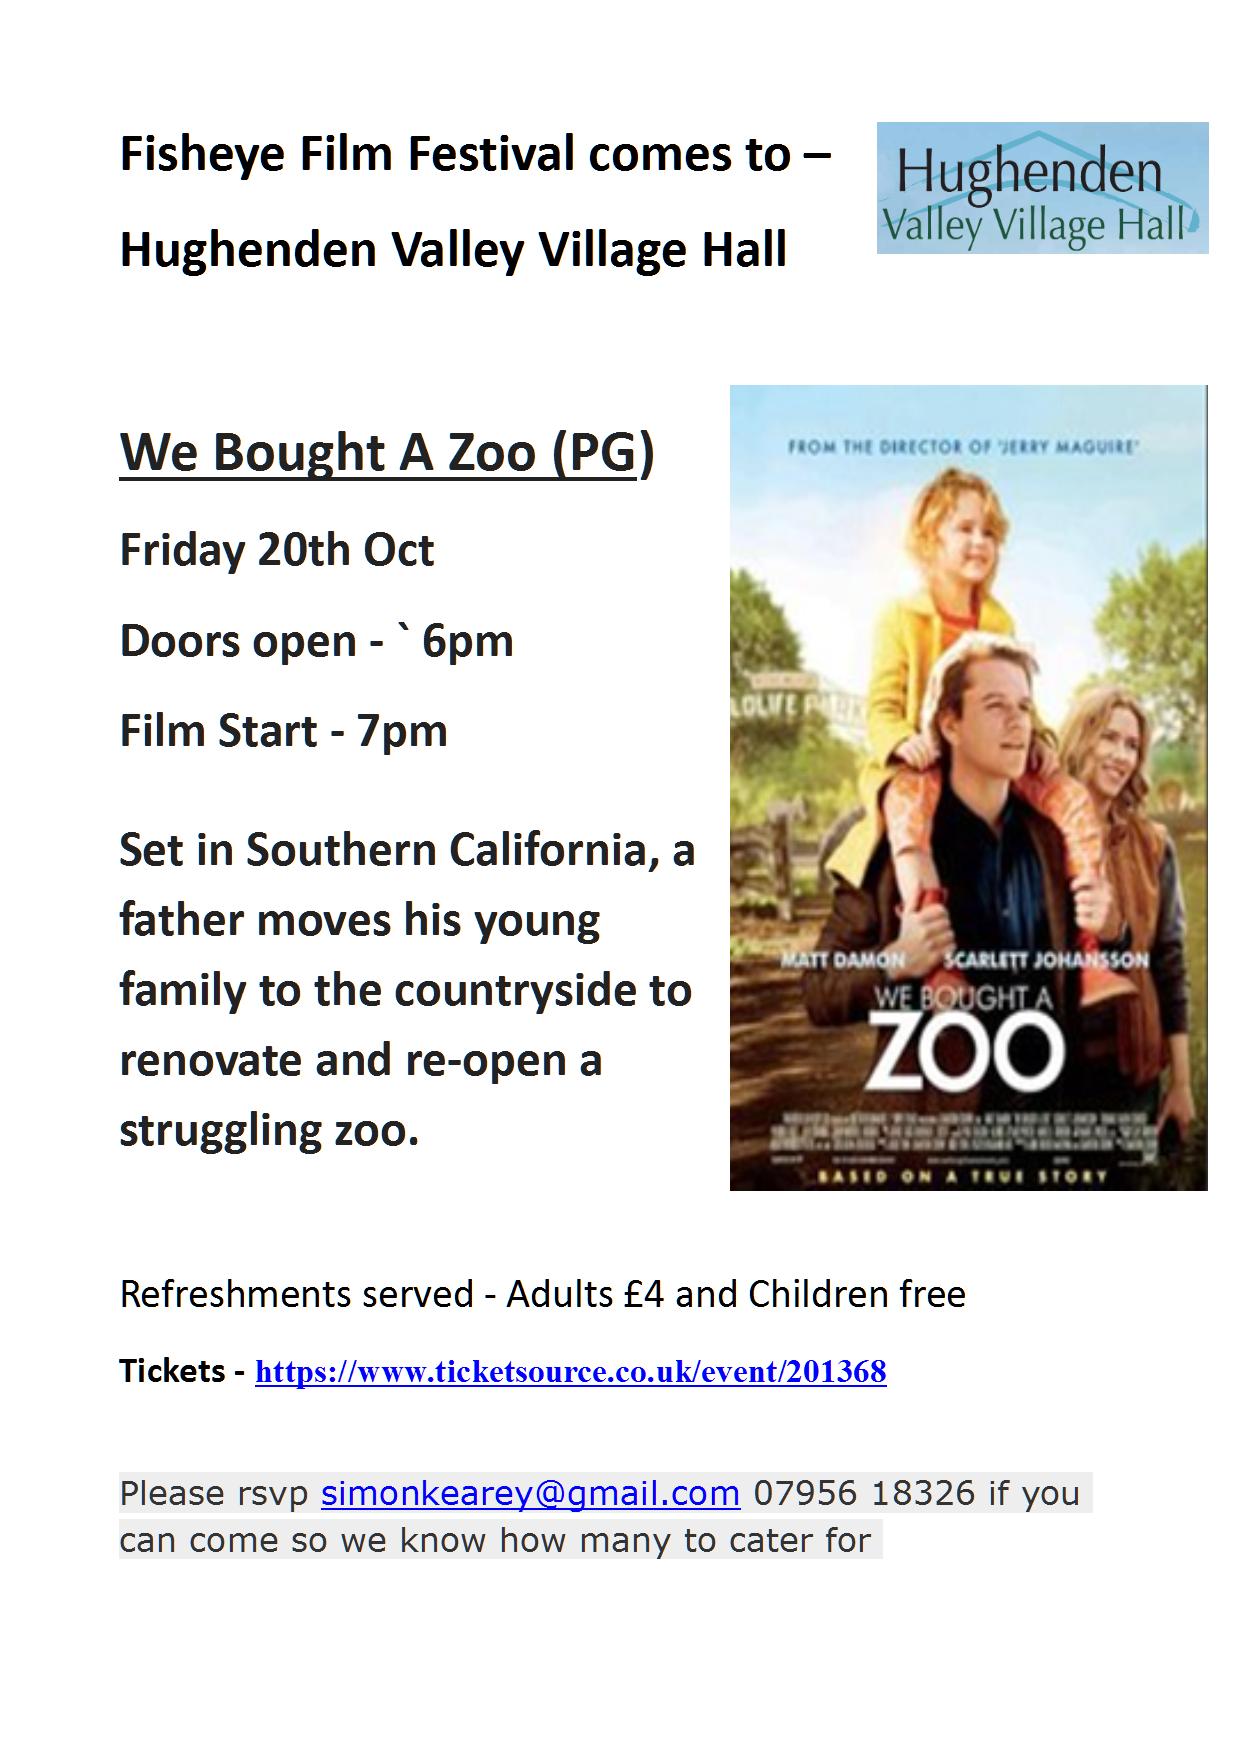 Hughenden Flyer - We Bought a Zoo